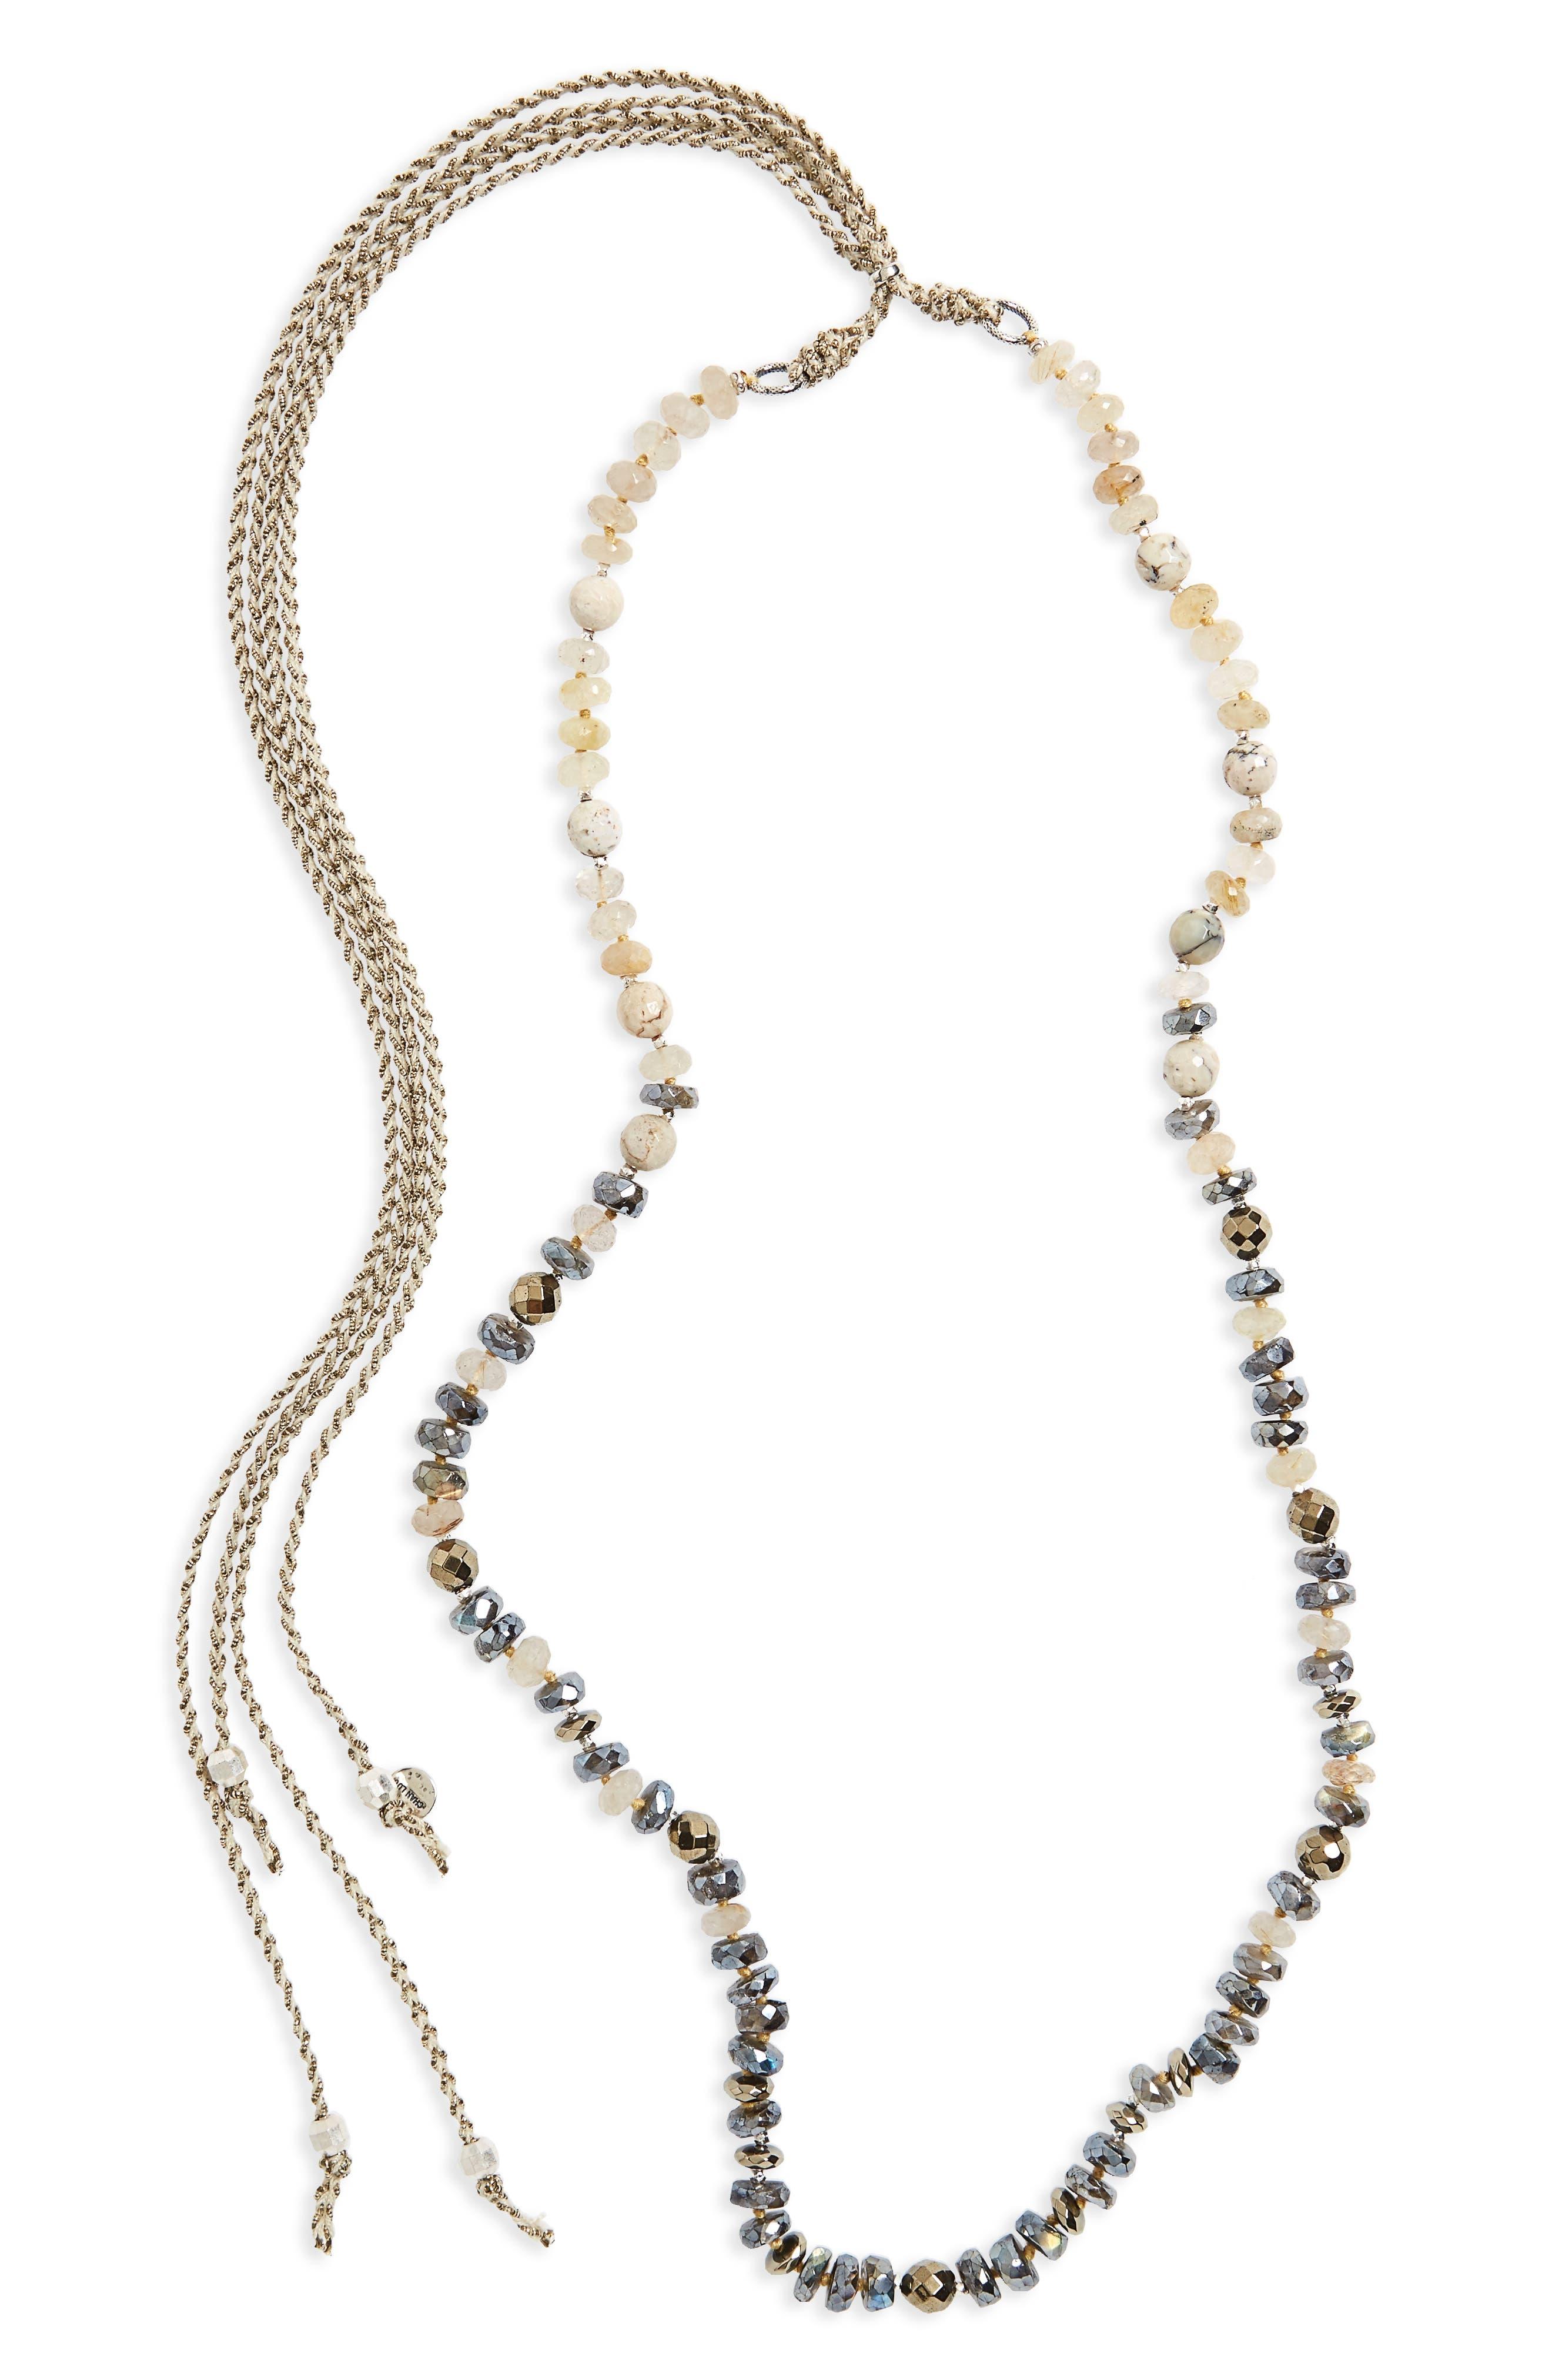 Semiprecious Stone Adjustable Necklace,                             Main thumbnail 1, color,                             040